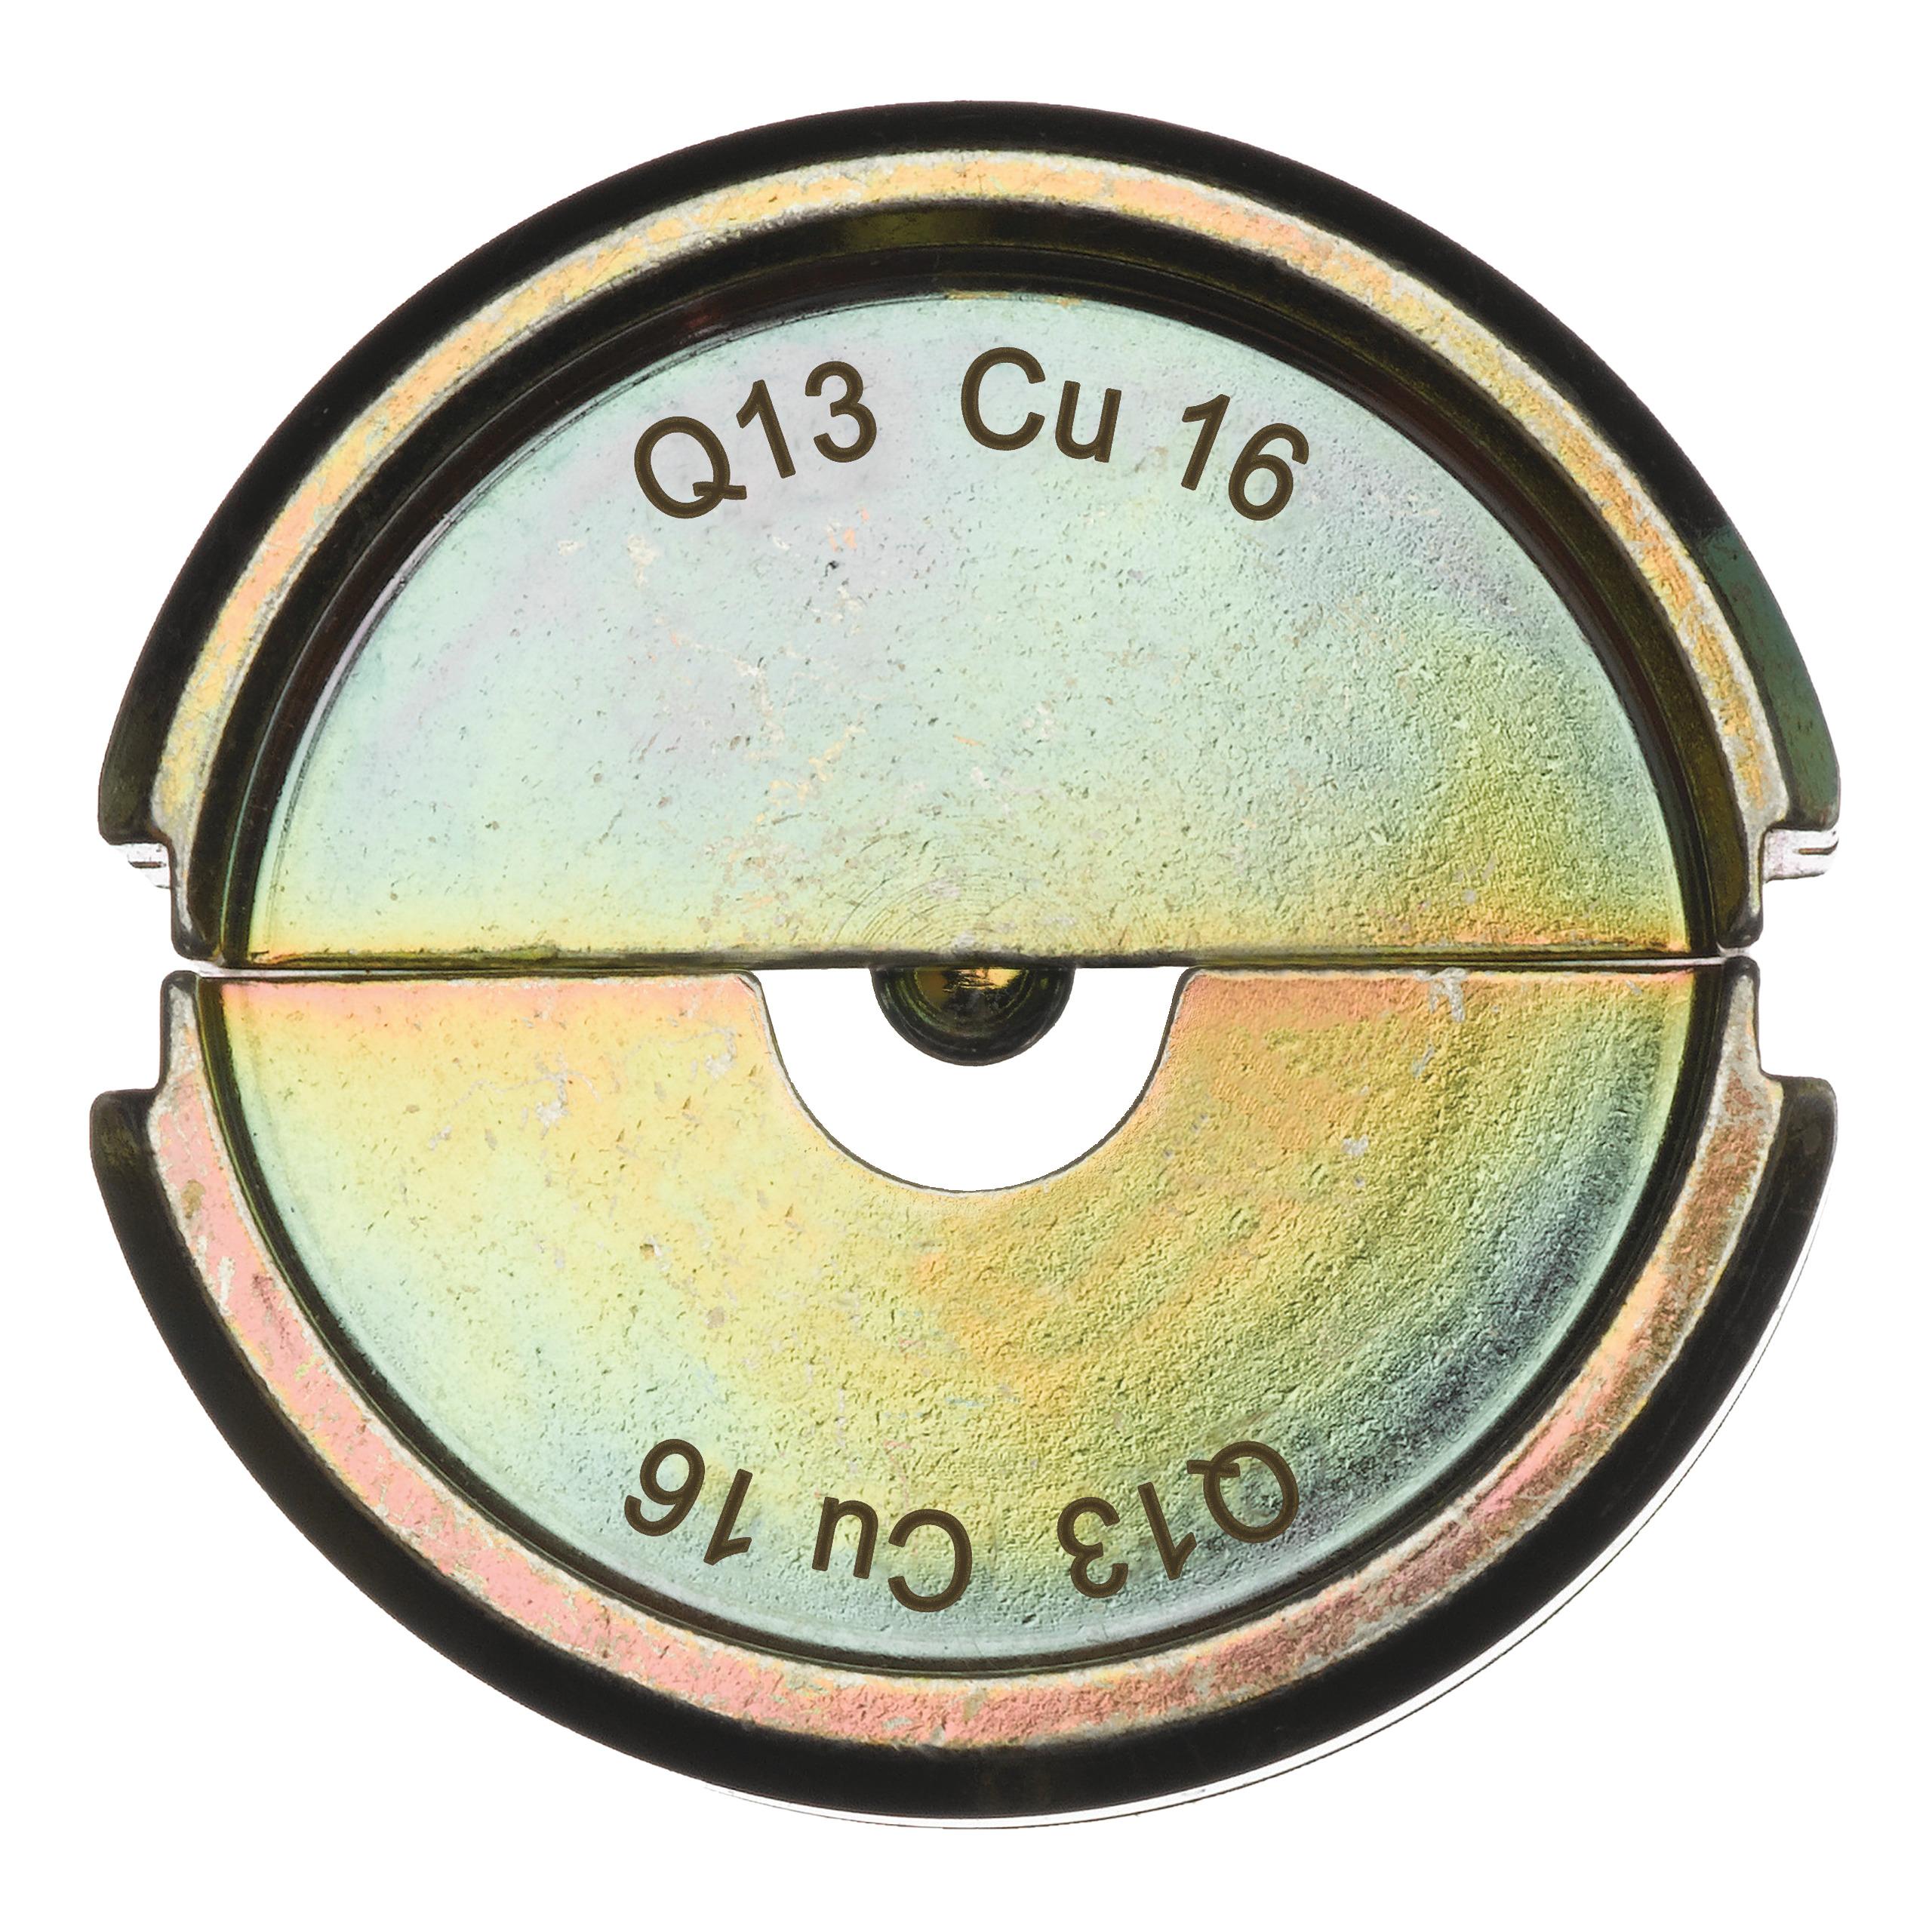 Q13 CU 16-1PC Pojistný kroužek